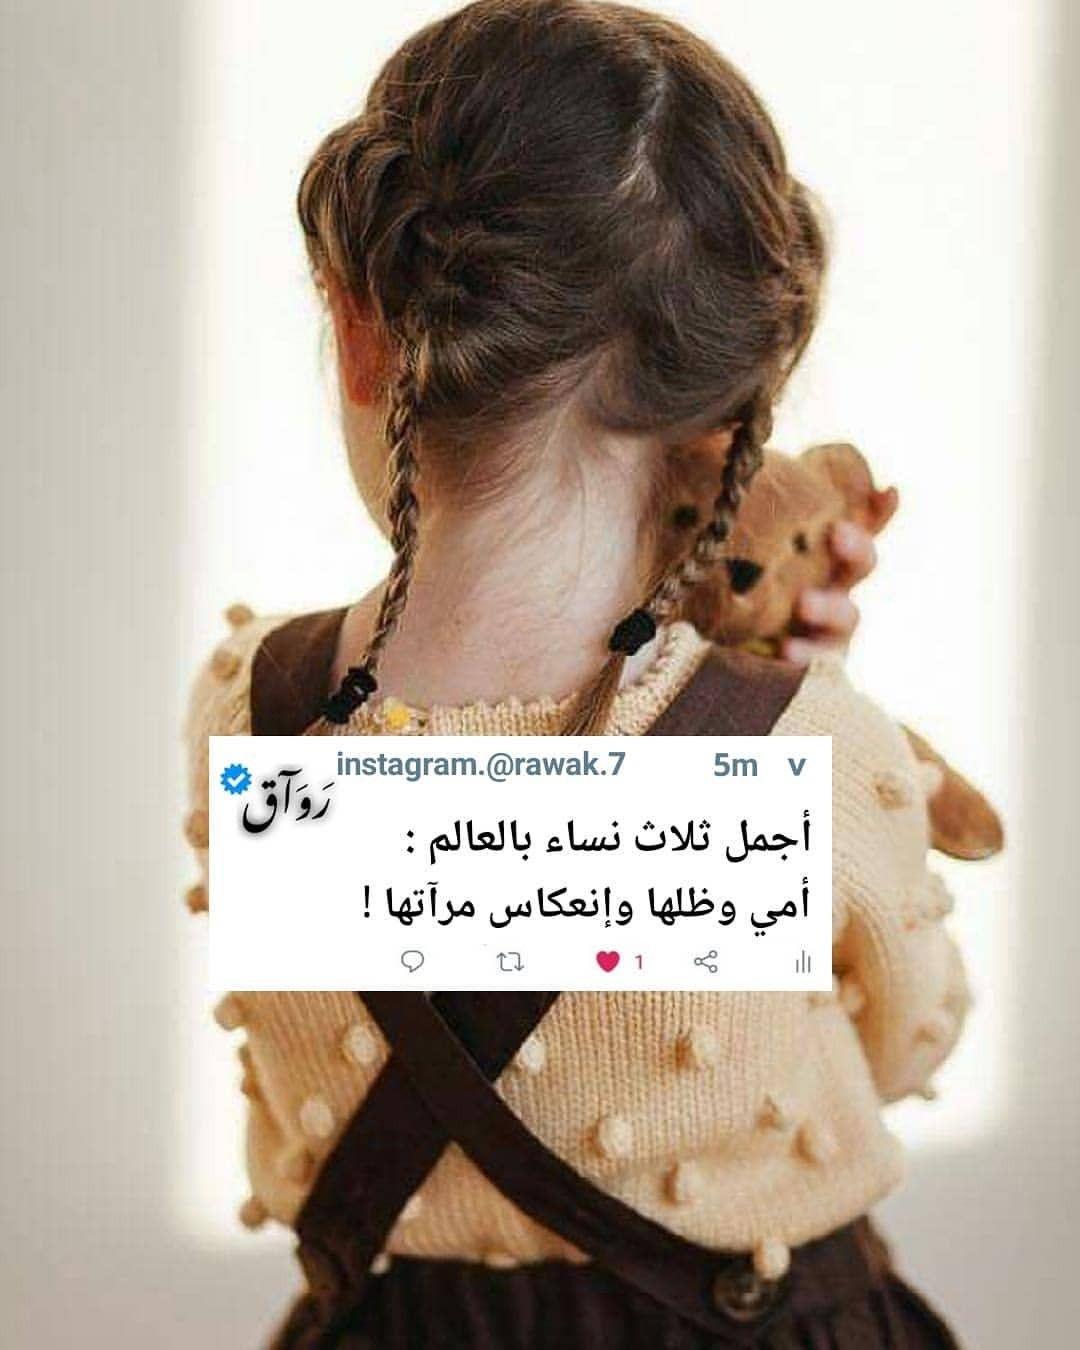 رحمك الله يا أمي Cool Words I Love You Mama Words